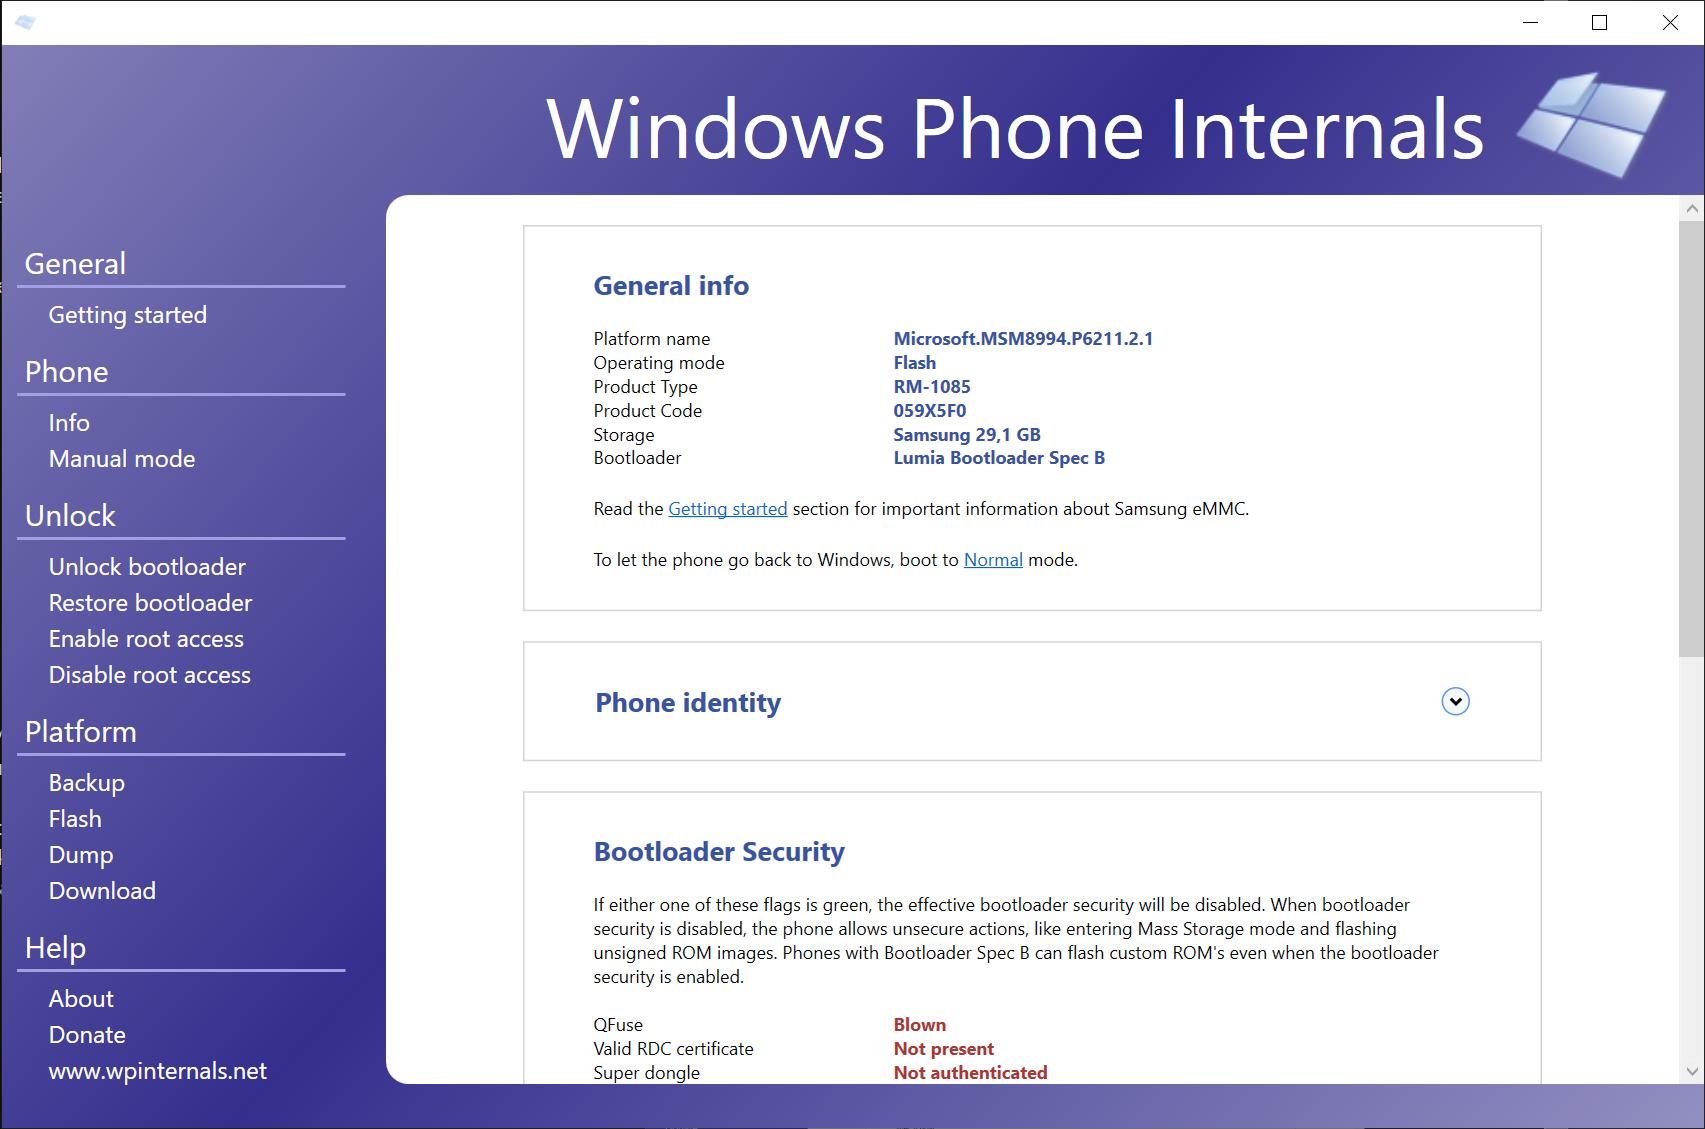 WPInternals showing phone details